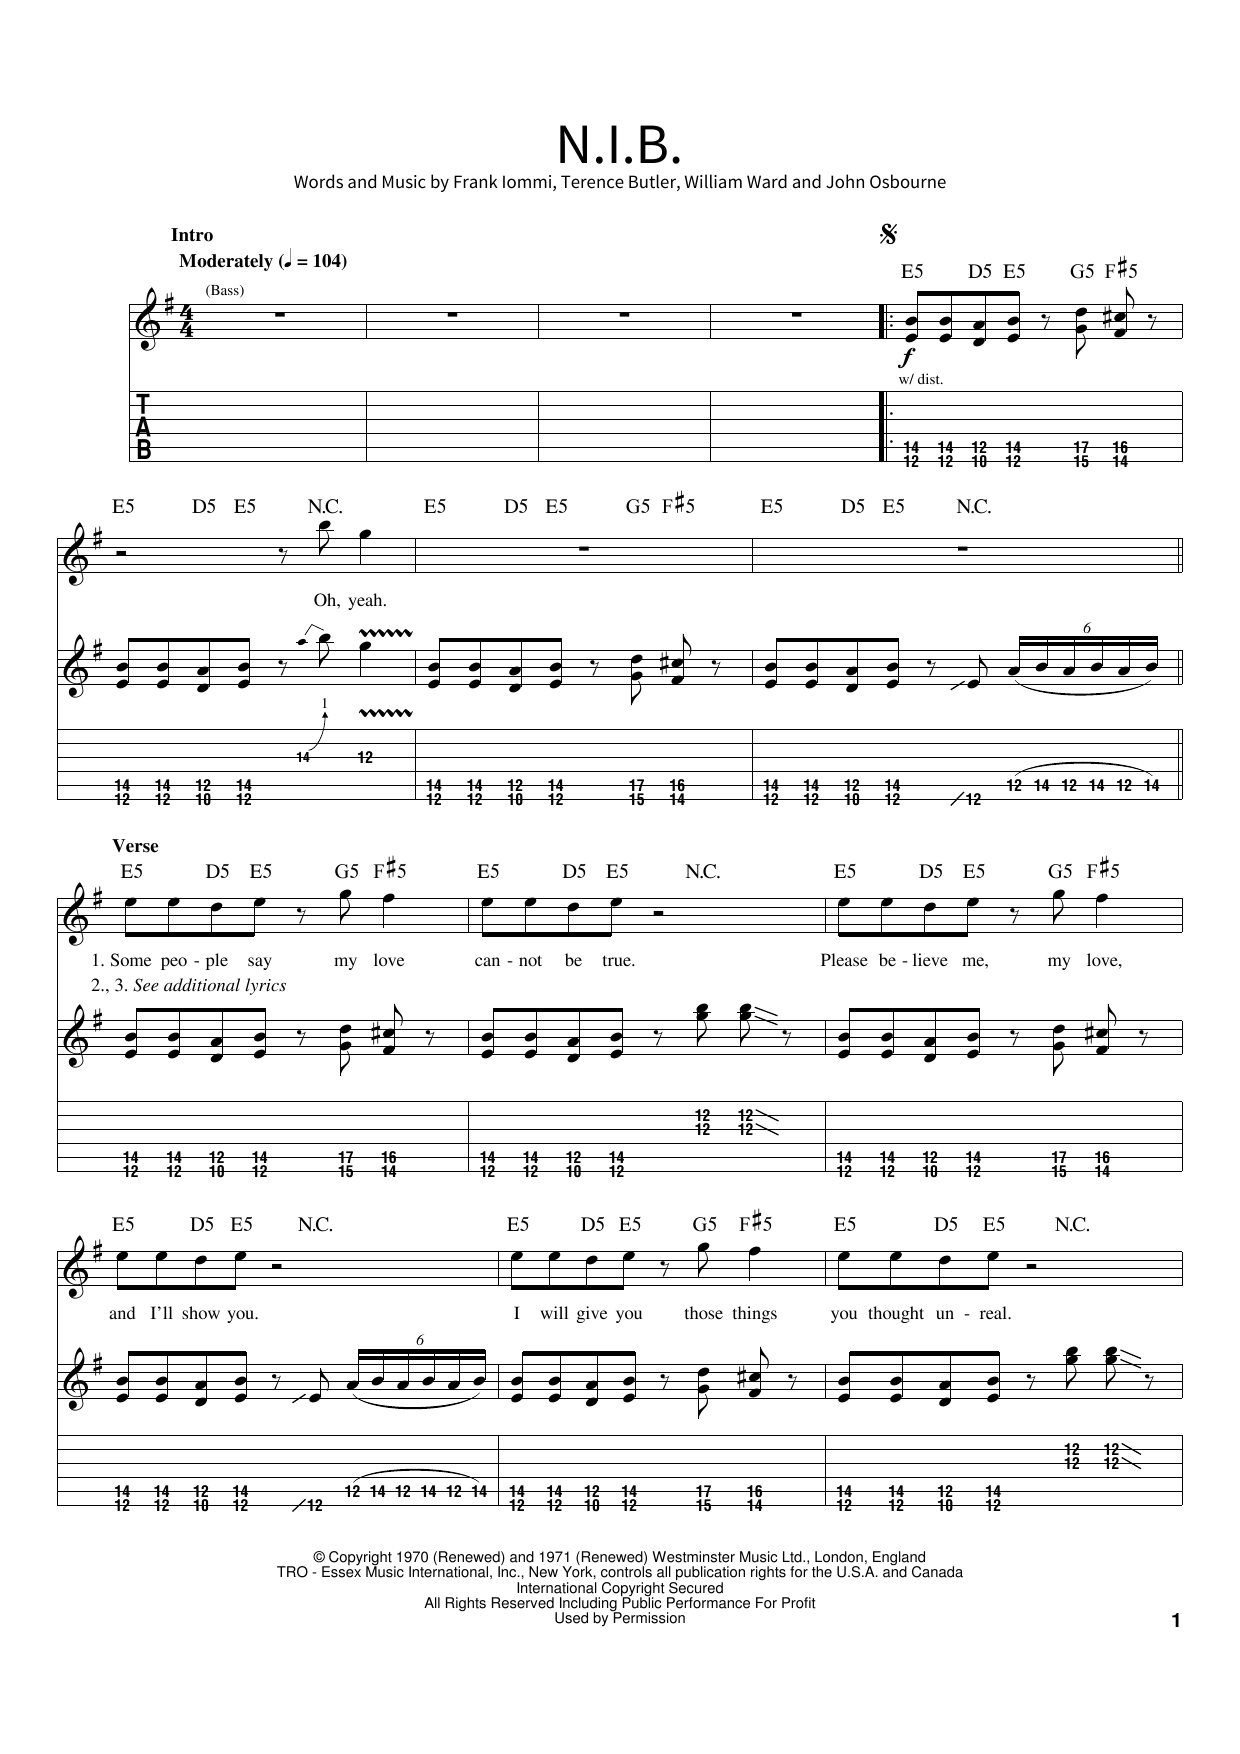 N.I.B. Sheet Music